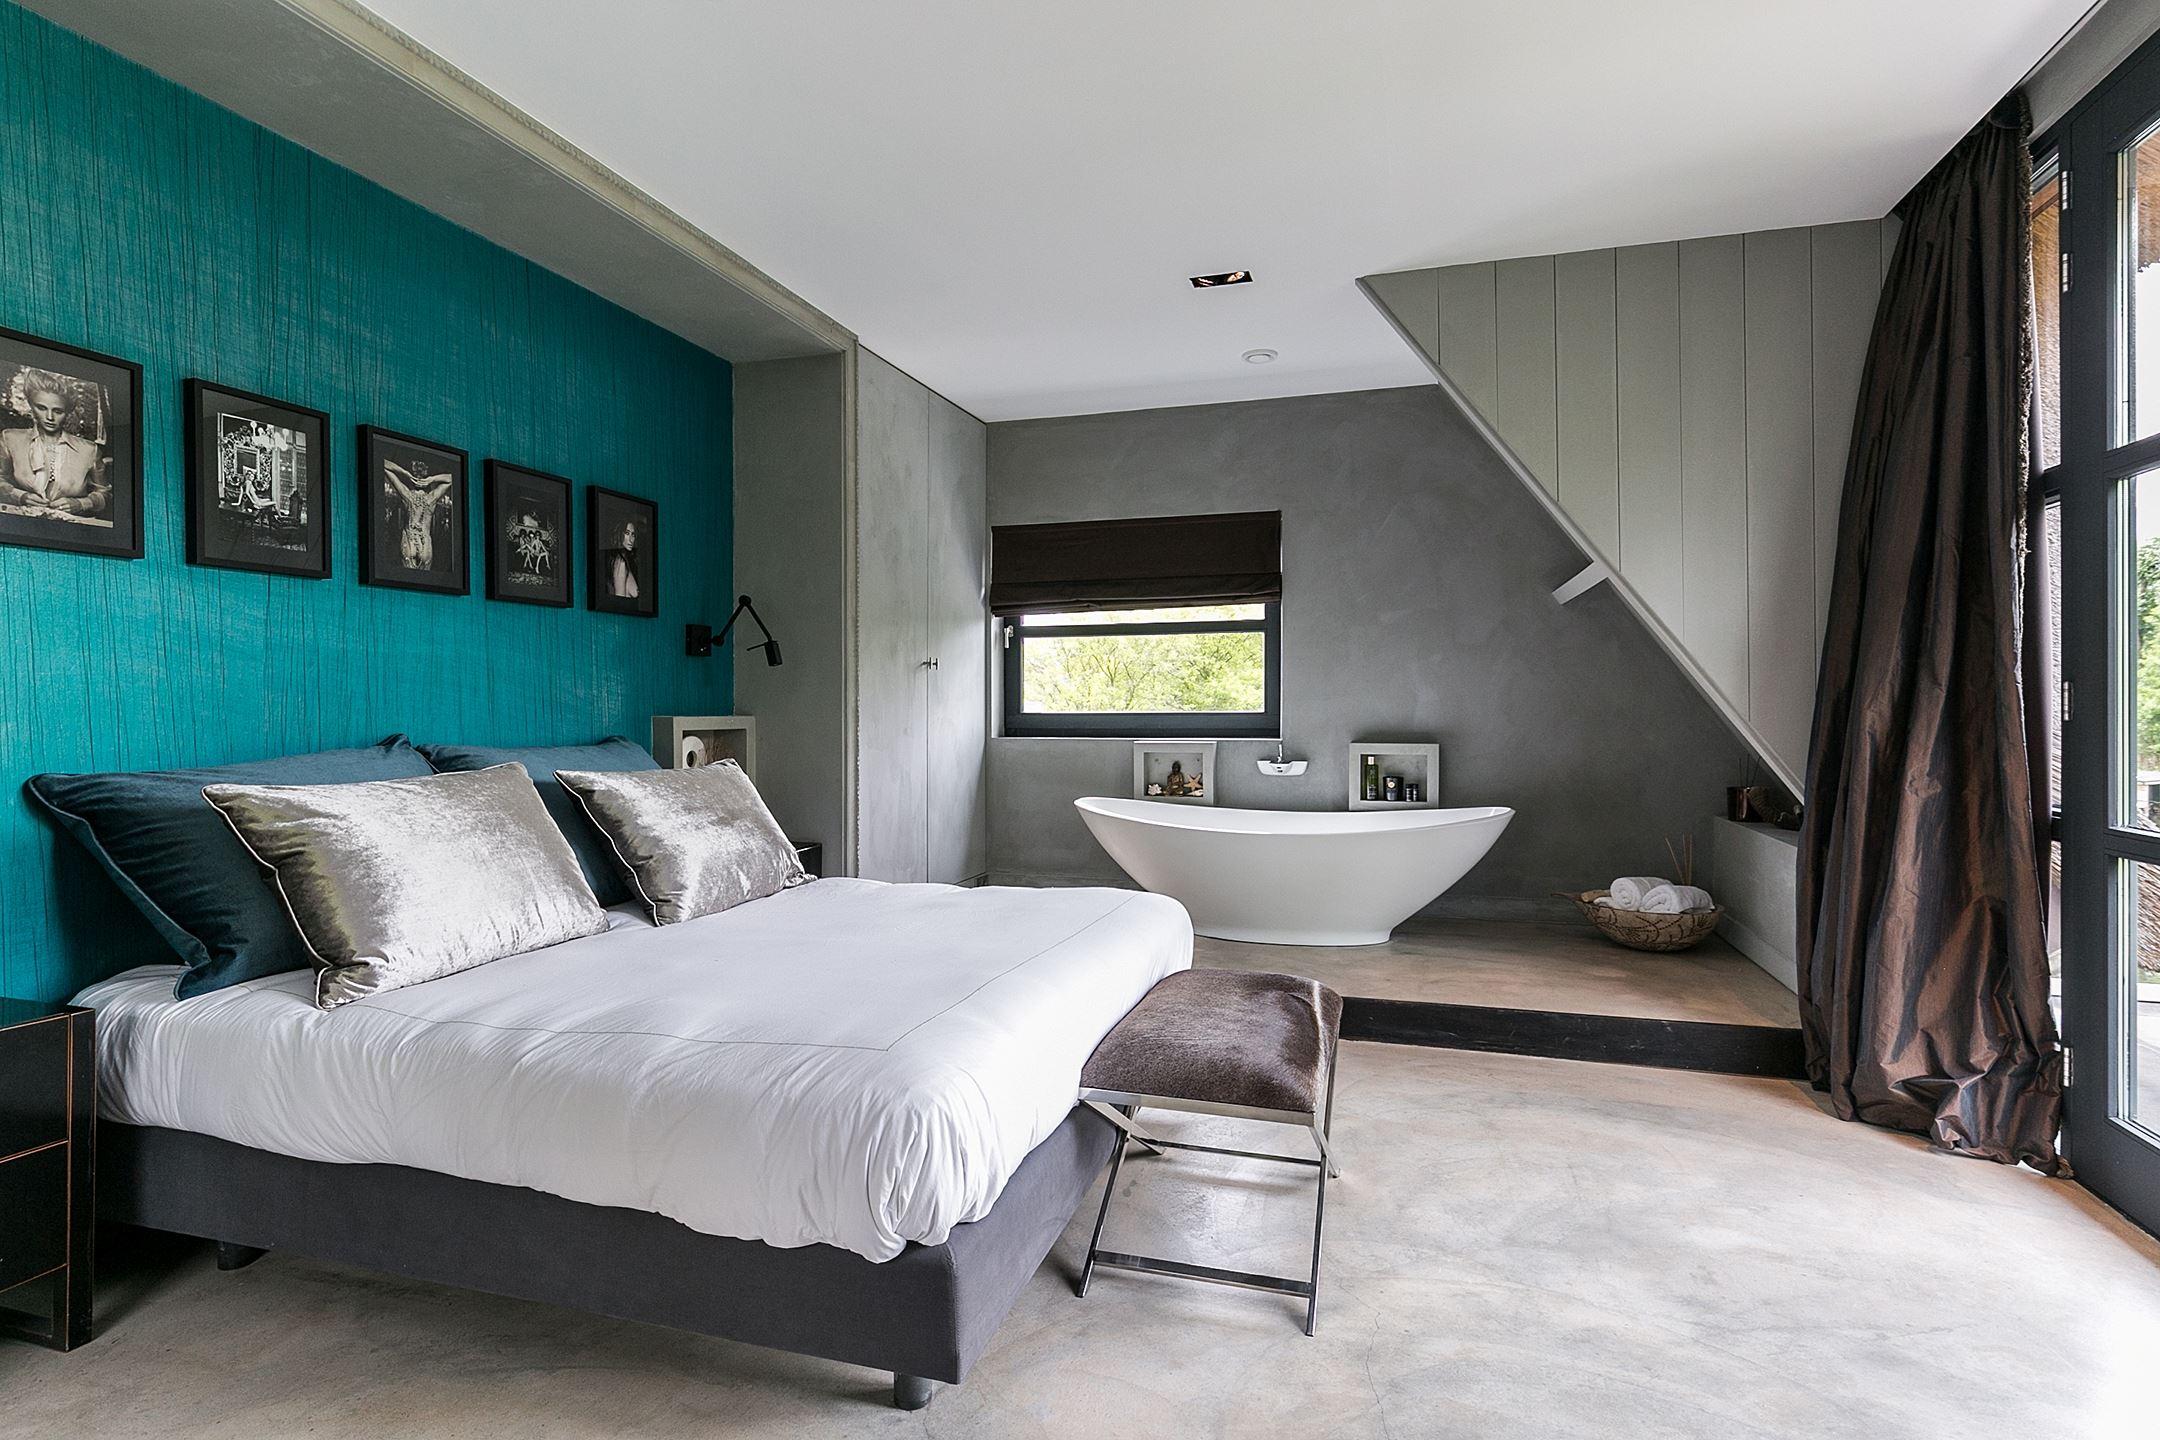 мансарда спальня кровать ванна